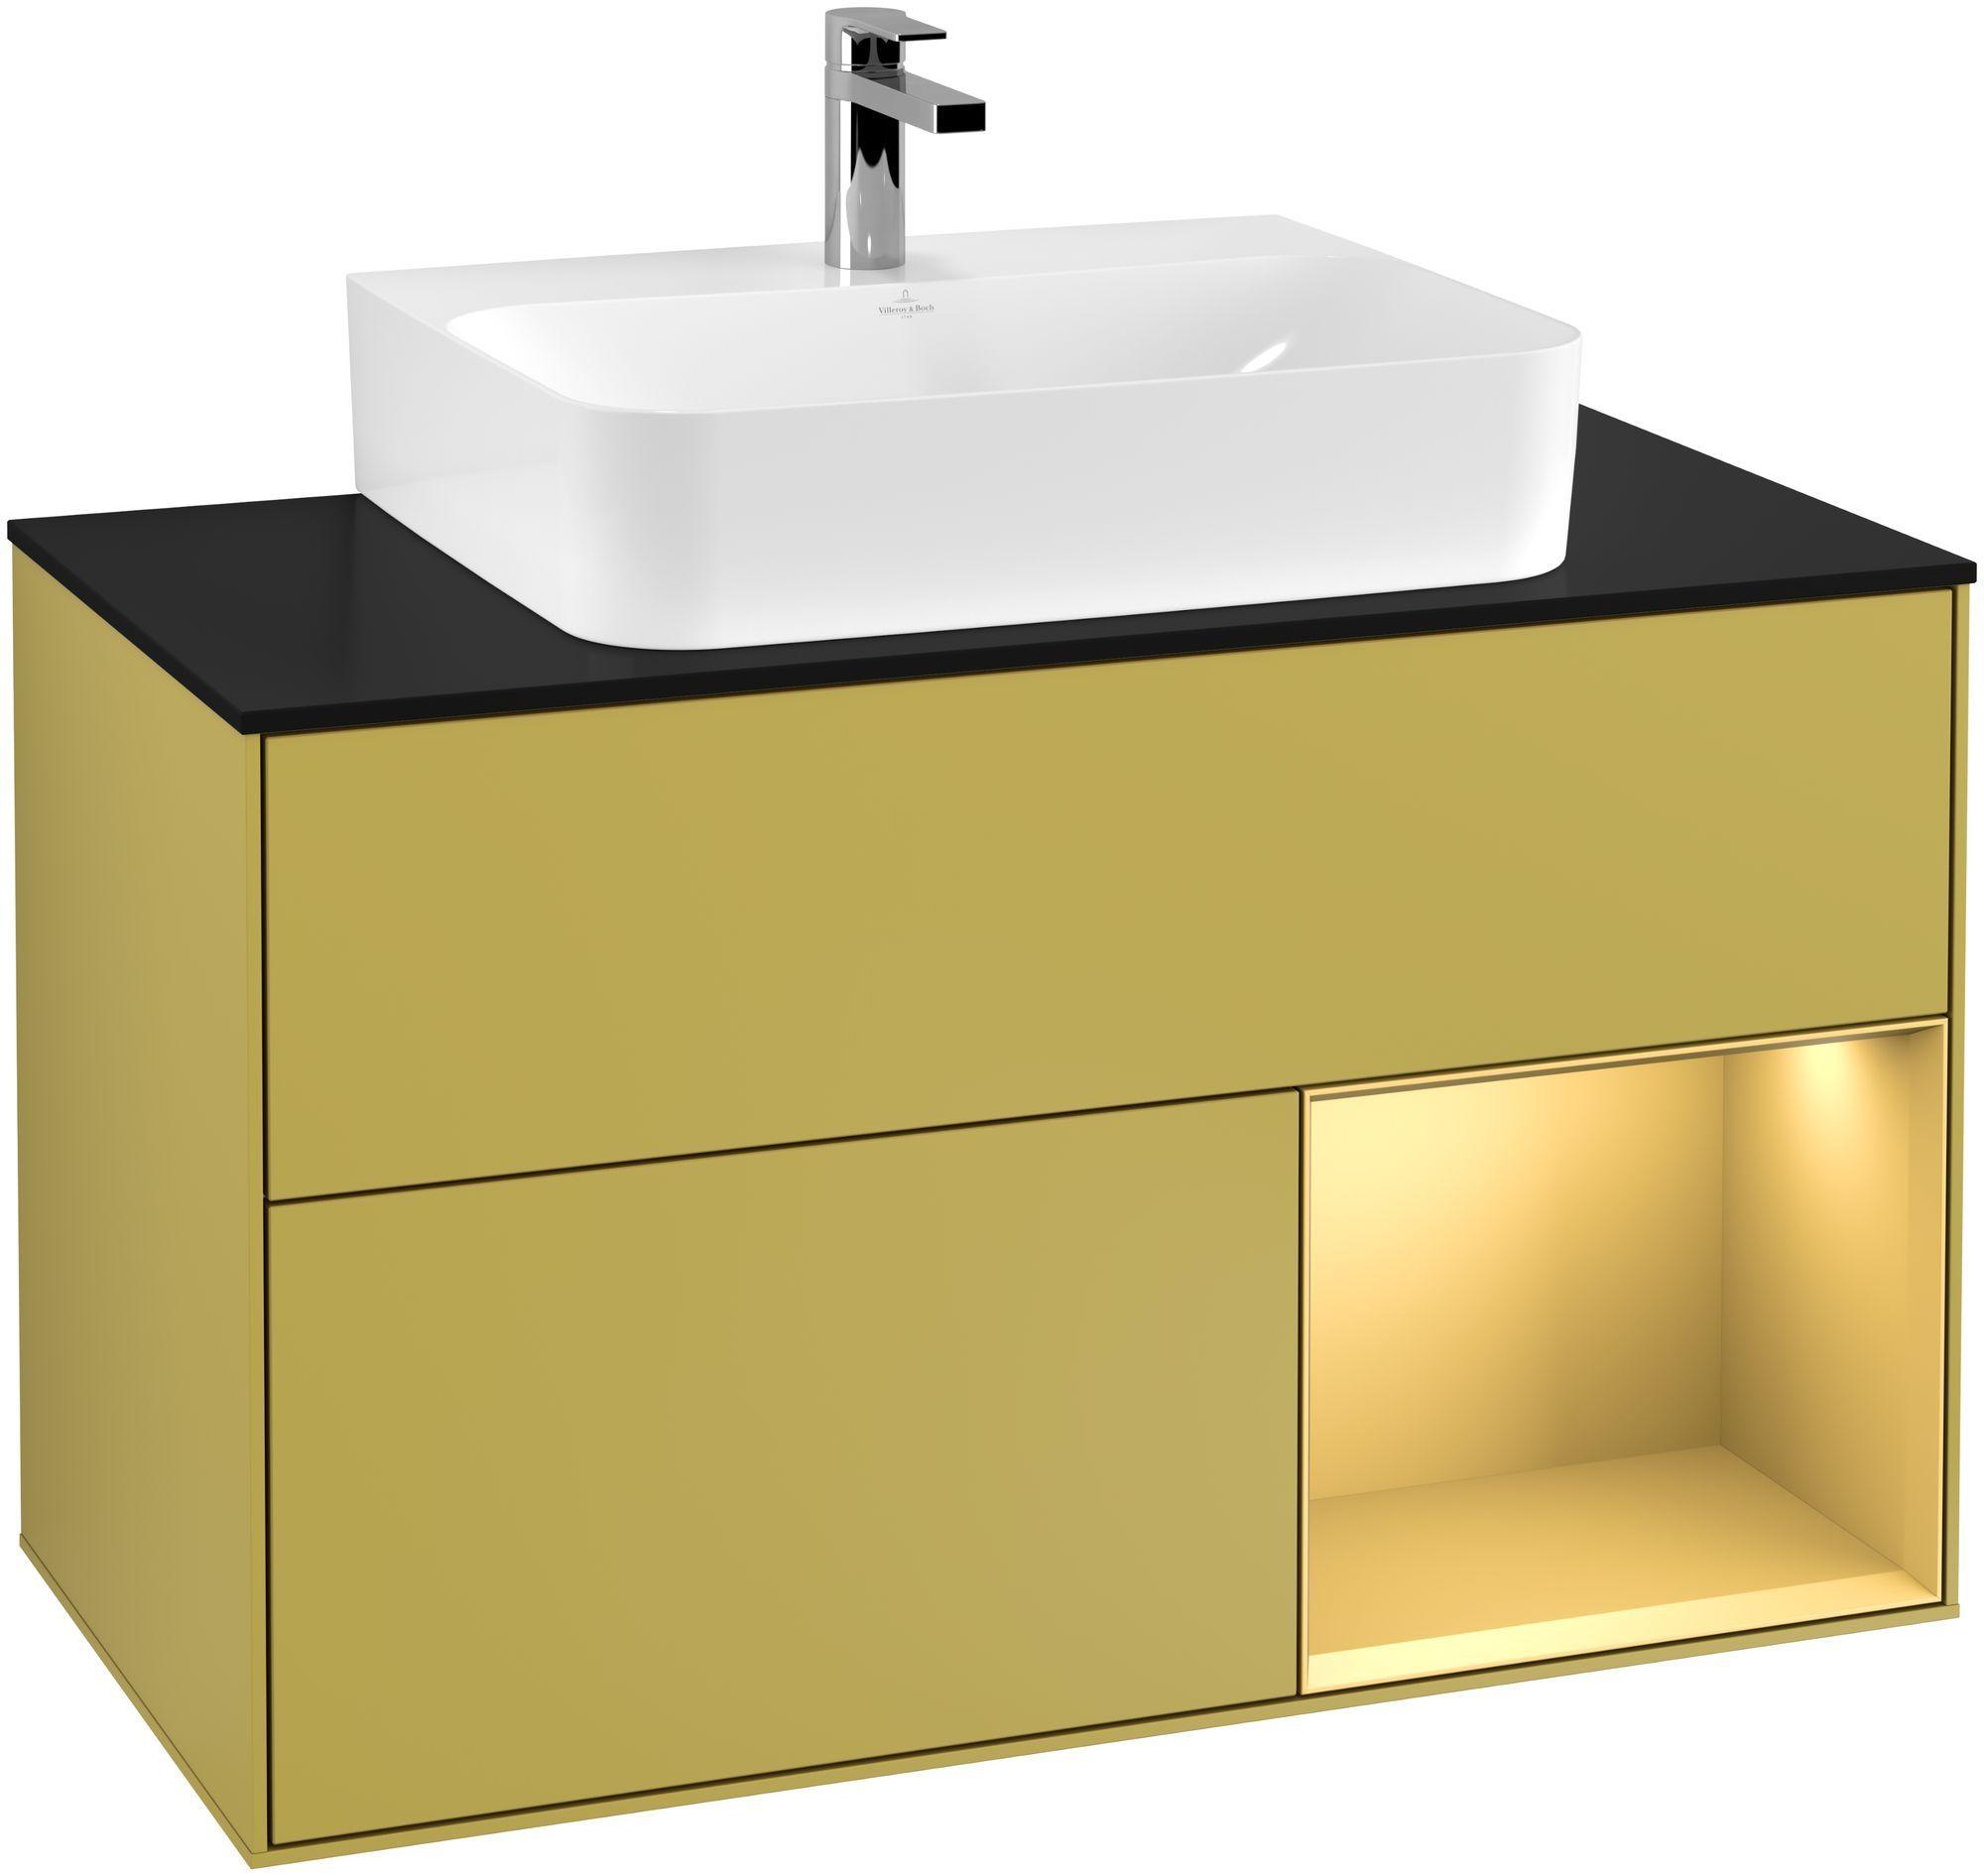 Villeroy & Boch Finion G12 Waschtischunterschrank mit Regalelement 2 Auszüge für WT mittig LED-Beleuchtung B:100xH:60,3xT:50,1cm Front, Korpus: Sun, Regal: Gold Matt, Glasplatte: Black Matt G122HFHE